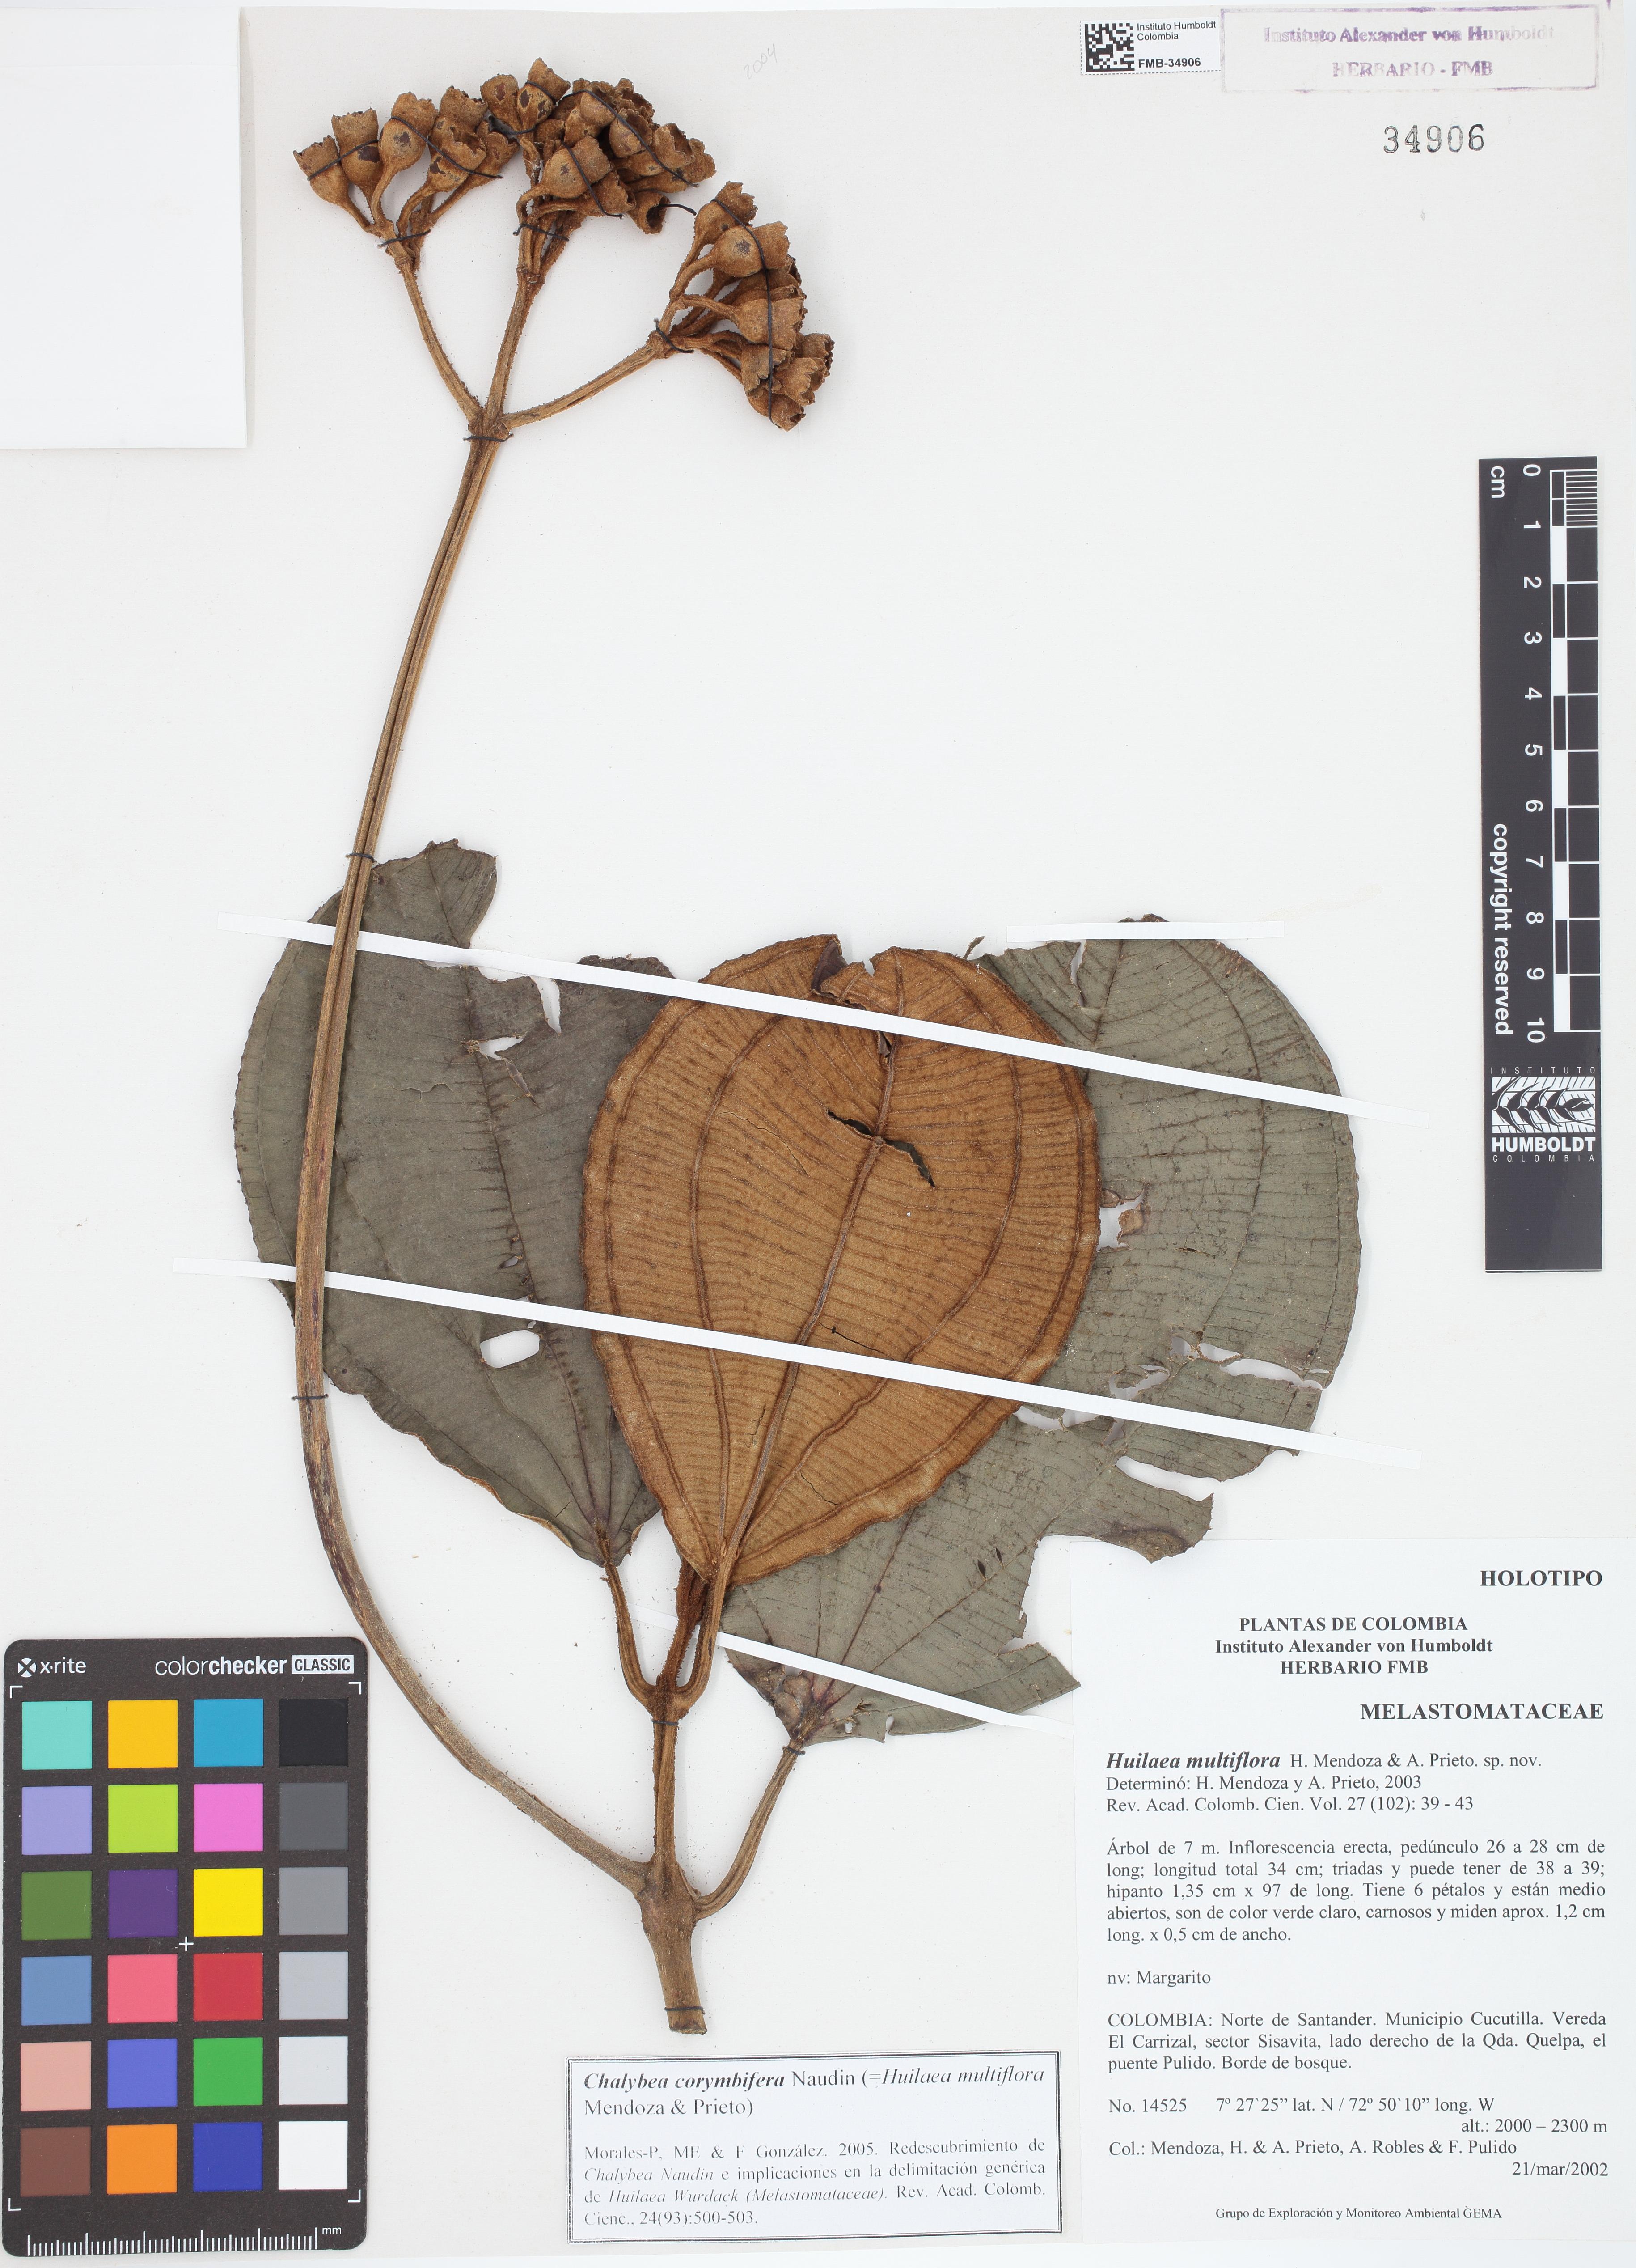 Holotipo de <em>Huilaea multiflora</em>, FMB-34906, Fotografía por Robles A.